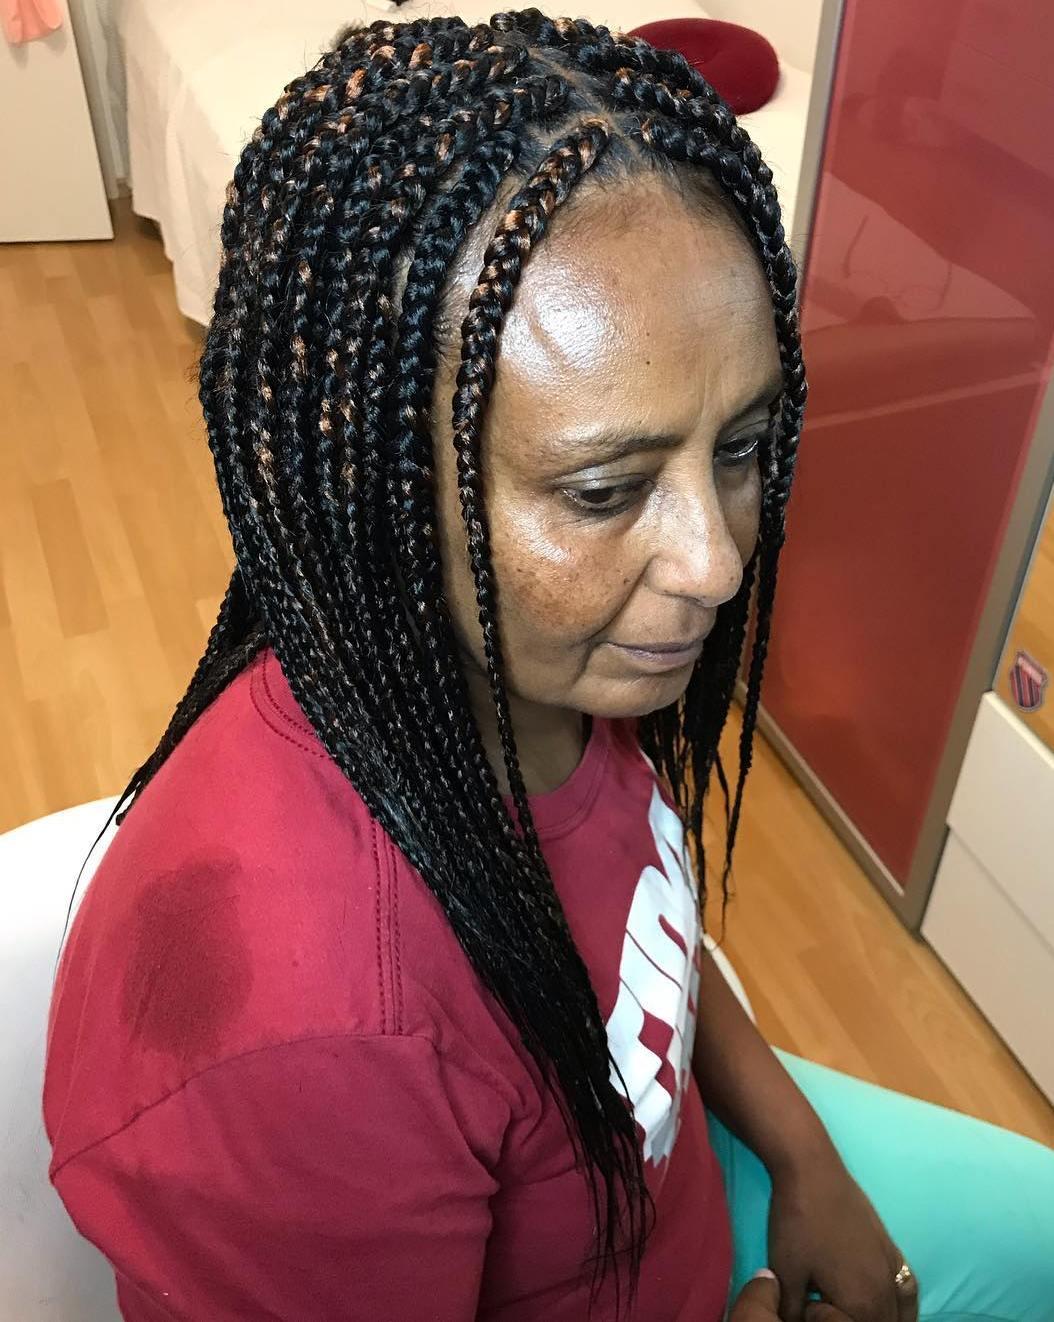 Popular Black Braided Hairstyle For Older Women